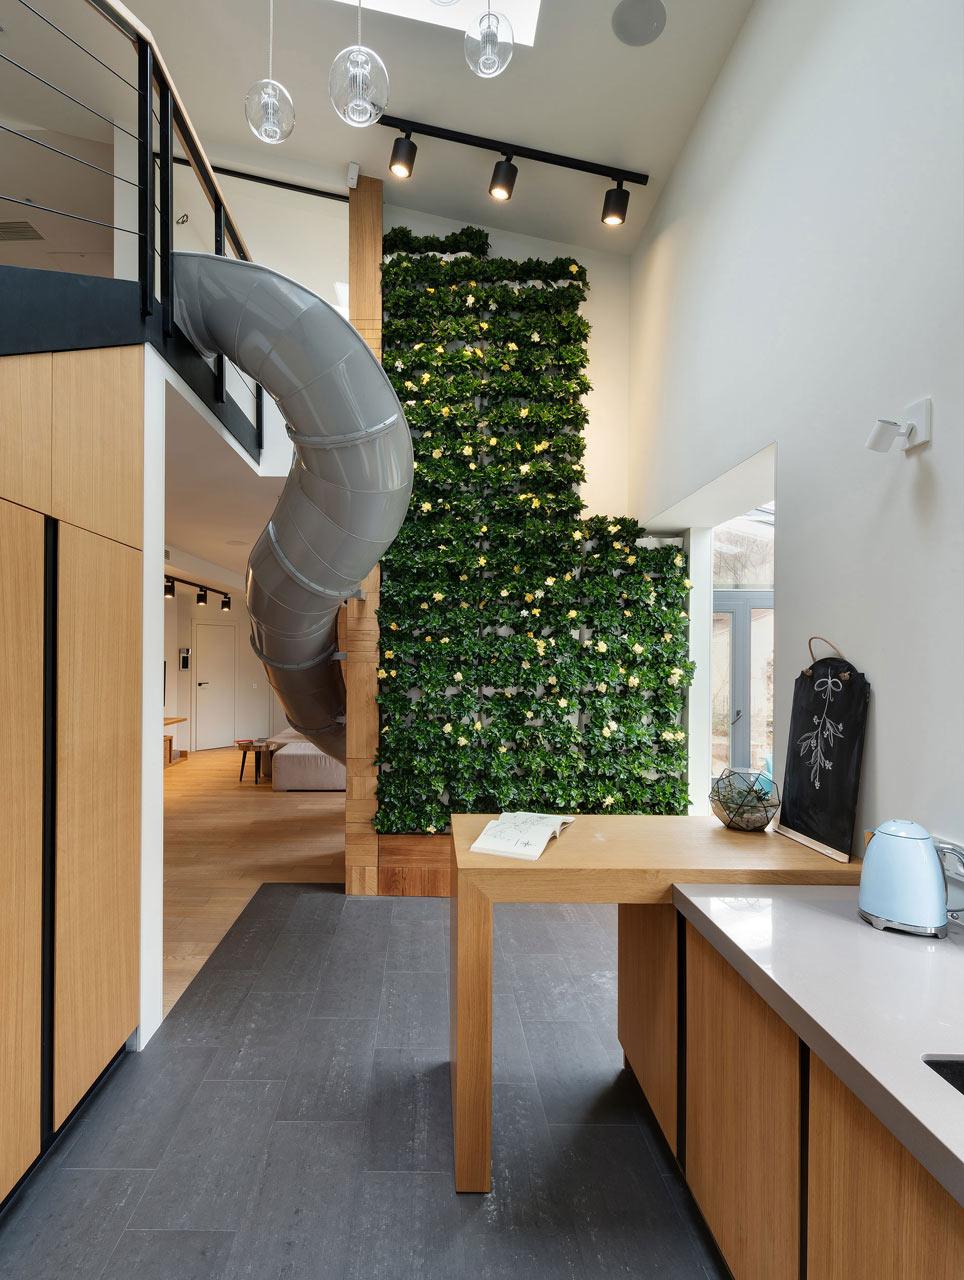 Apartment-with-a-slide-Ki-Design-Studio-2.jpg